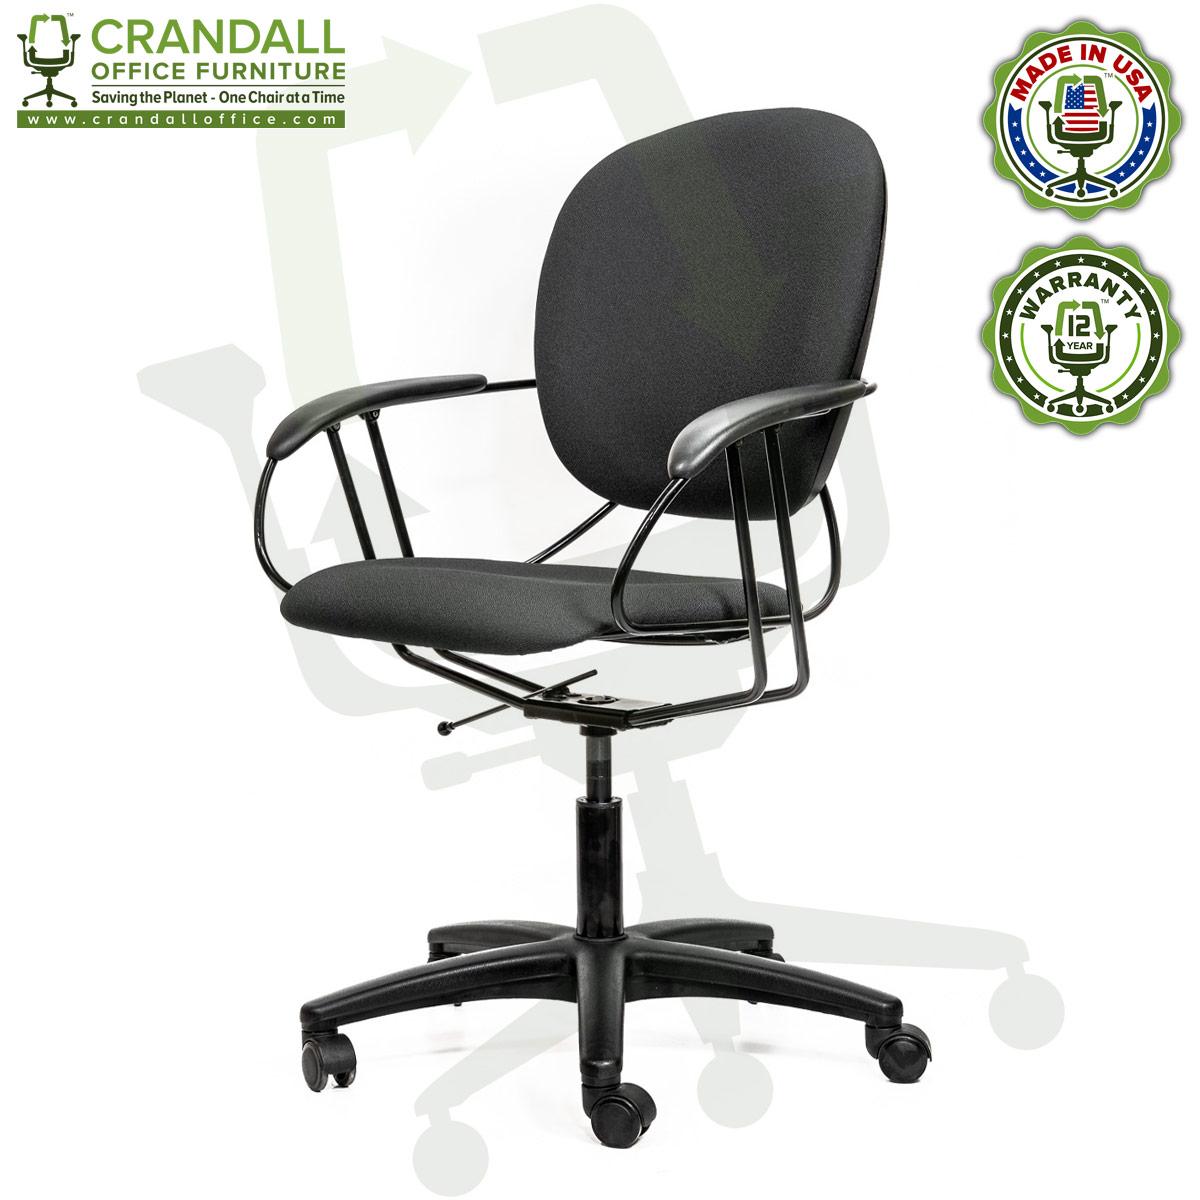 Remanufactured Steelcase Turnstone TS311 Uno Chair - 02